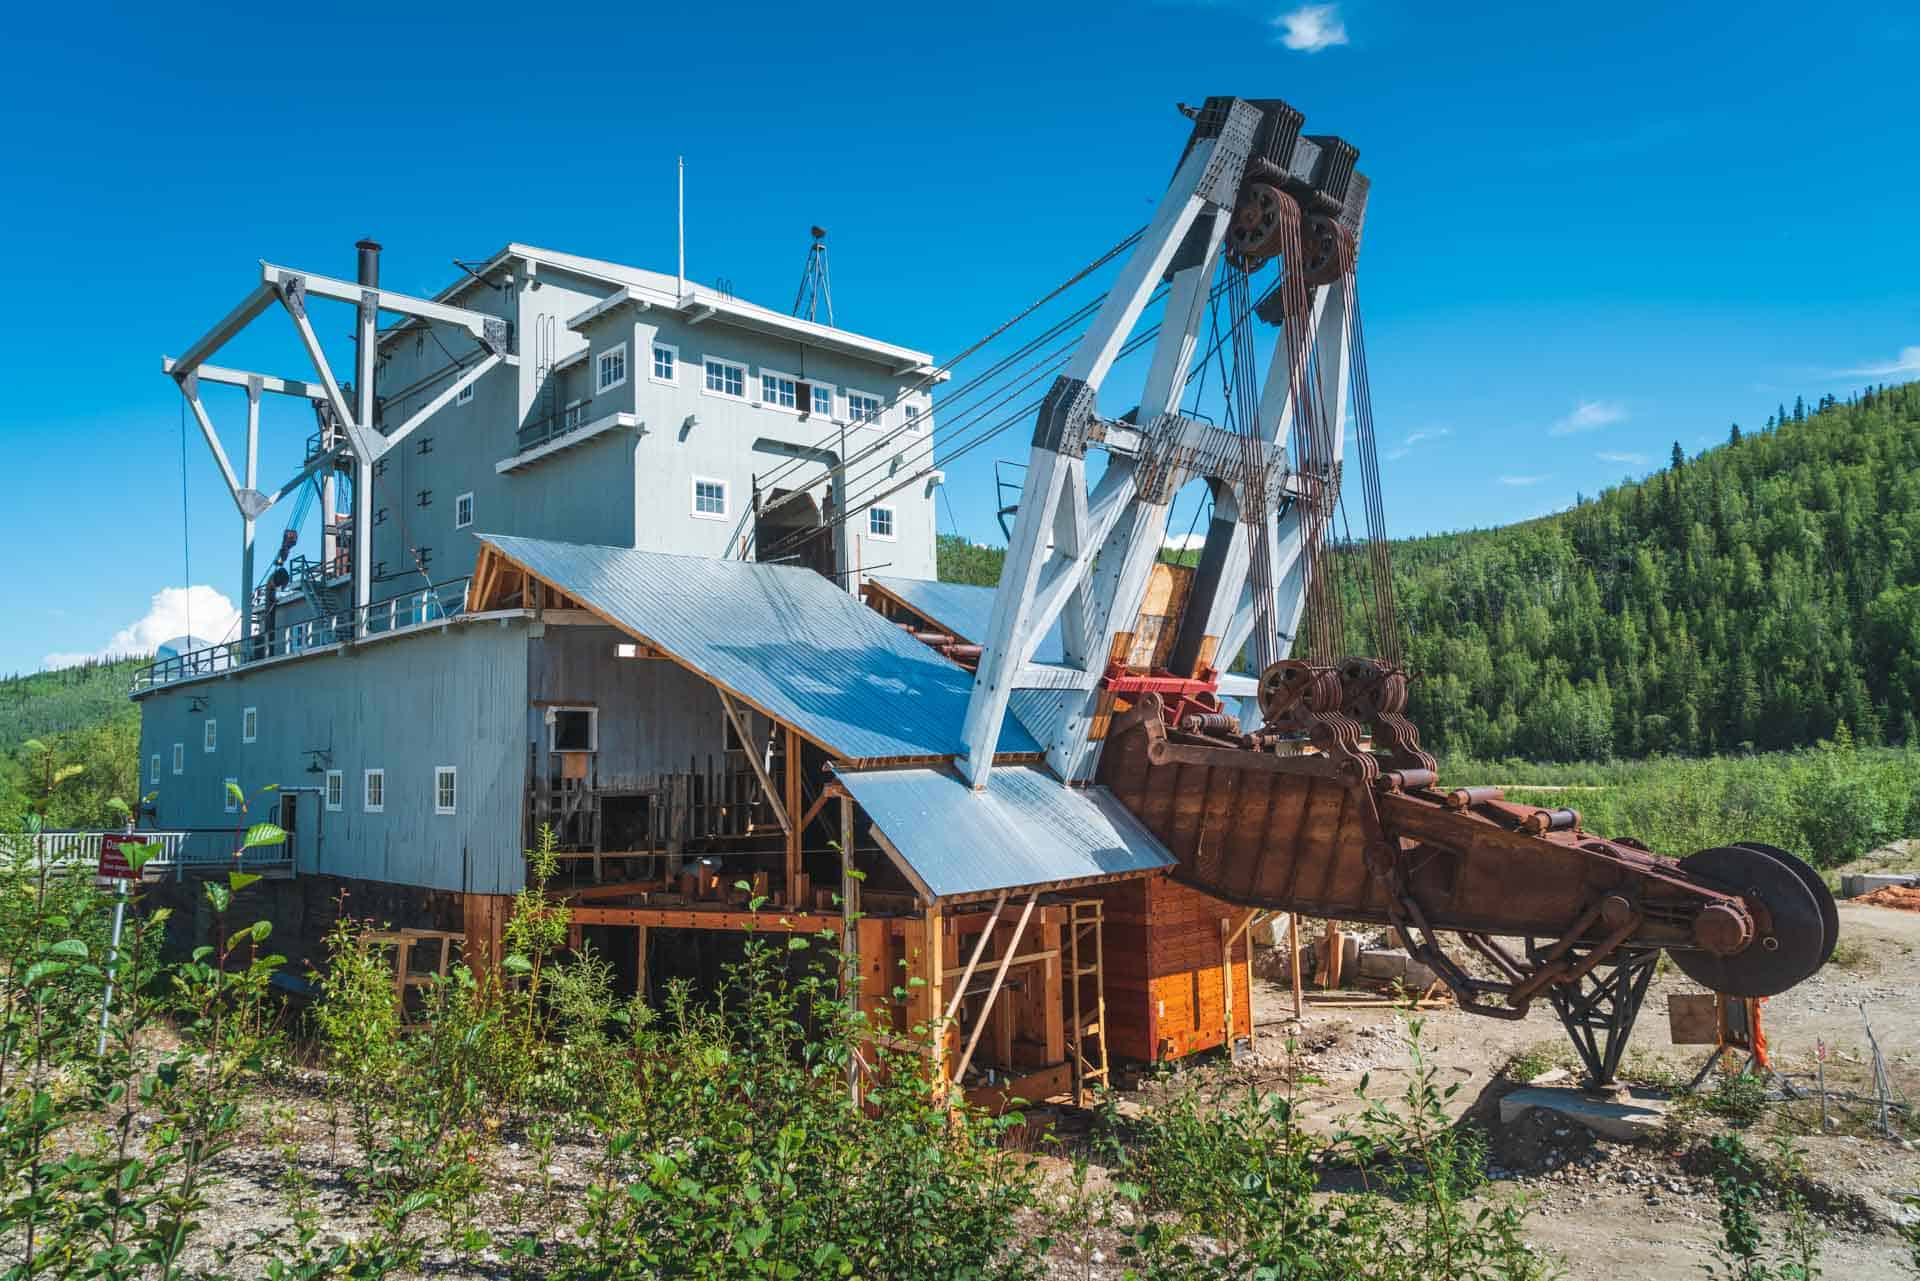 dredge 4 gold mine dawson city